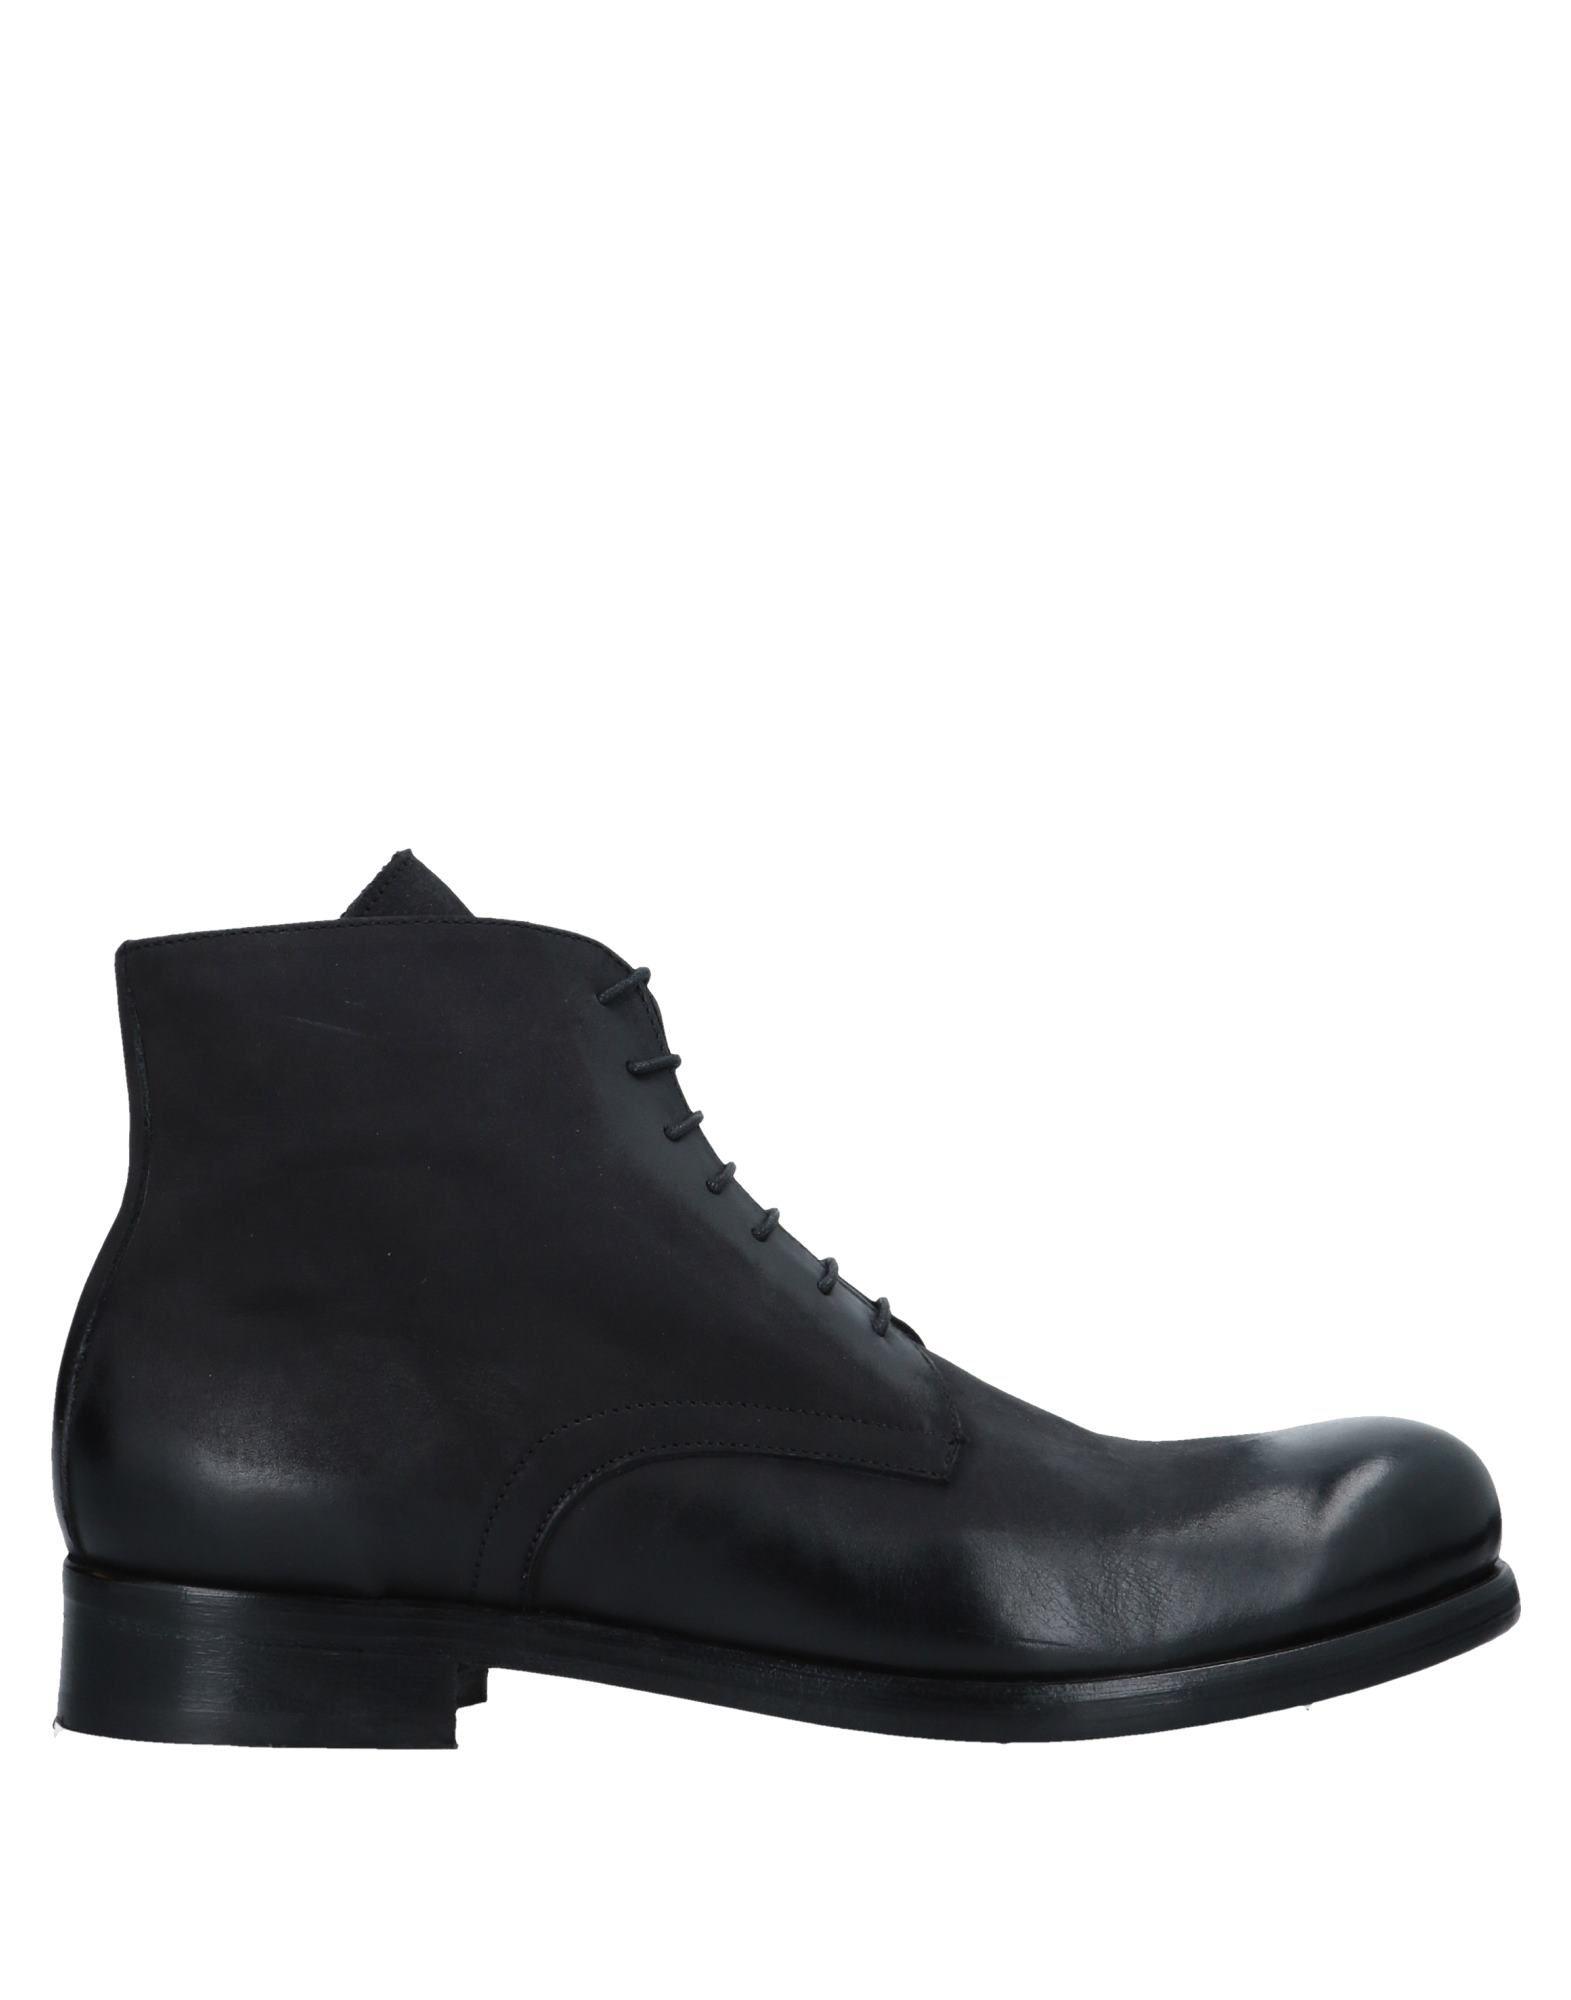 Rabatt echte Schuhe Savio Barbato Stiefelette Herren  11536879KV